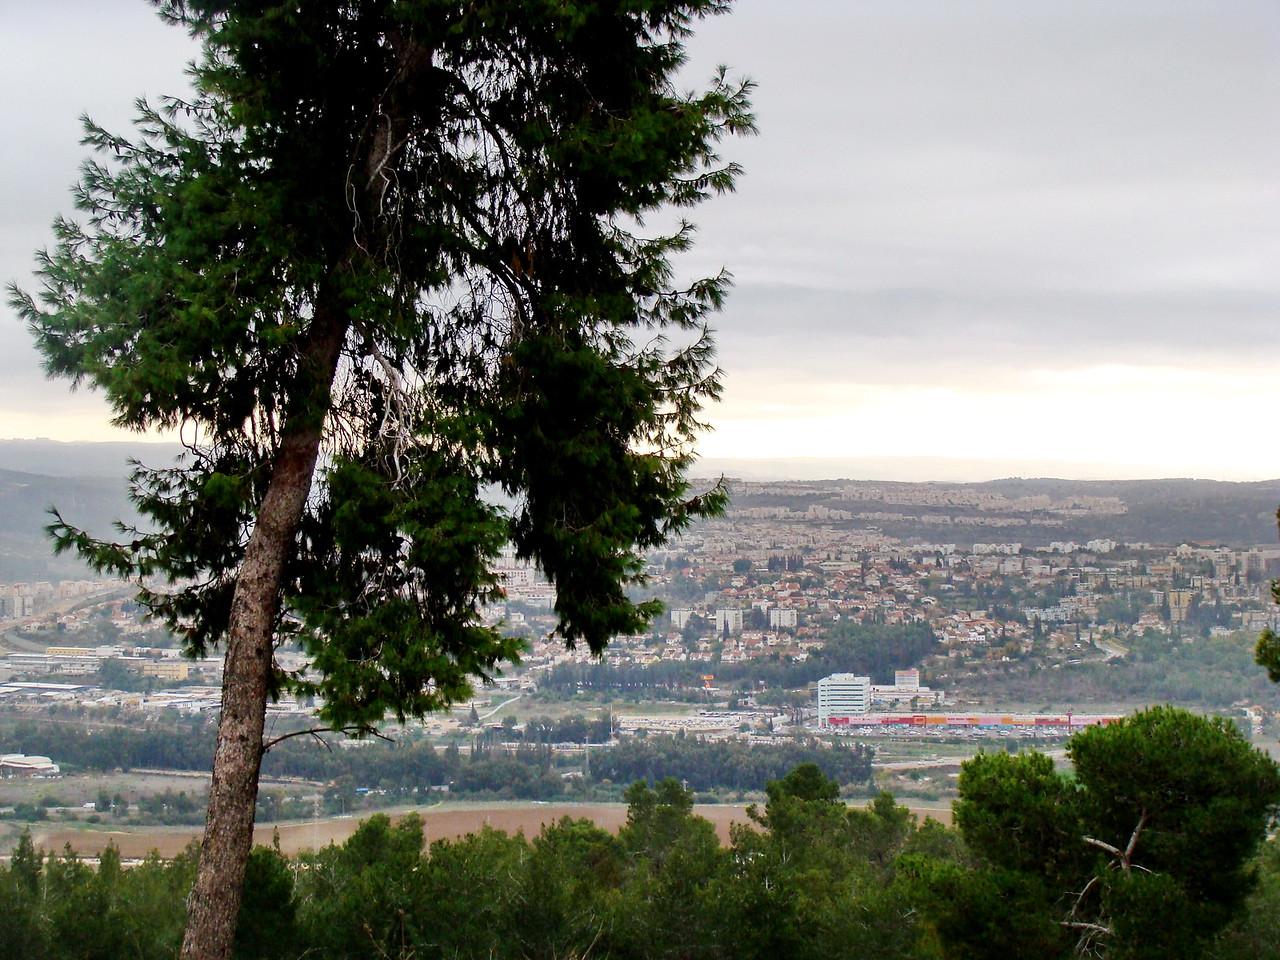 Beit Shemesh Vista